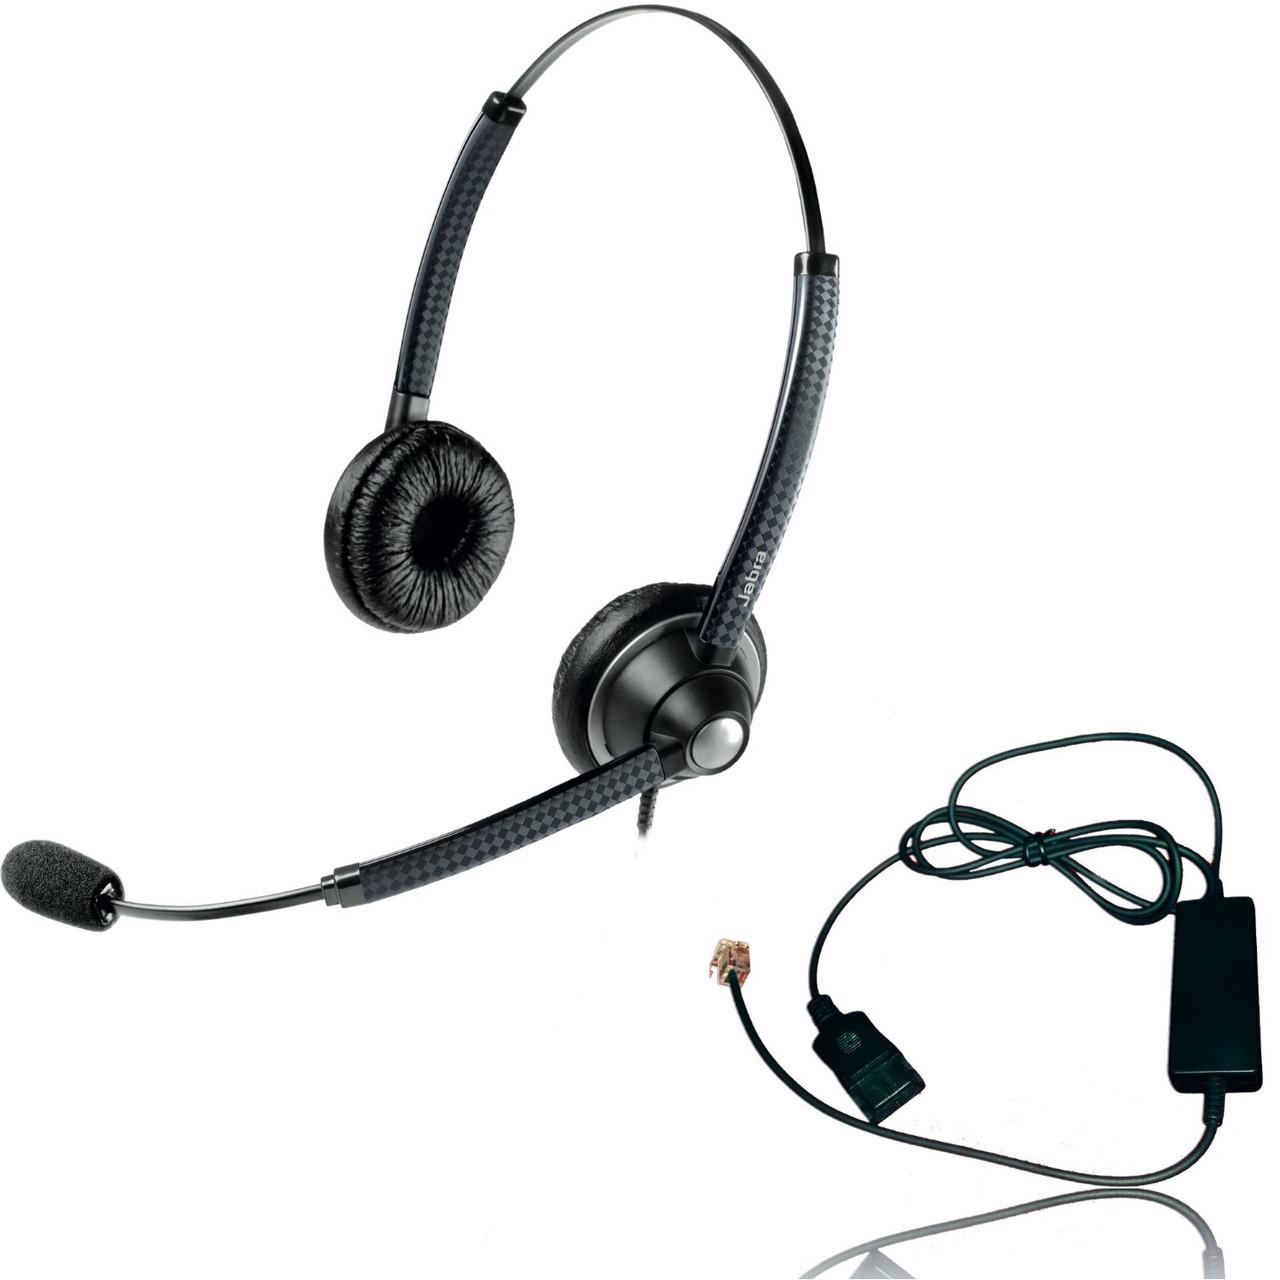 Jabra 1925 Headset | w/Telephone Cord RJ-9 | Cisco, Mitel, Polycom,  Norstar, Meridian, Aastra, Yealink, Allworkx, Nortel, NEC